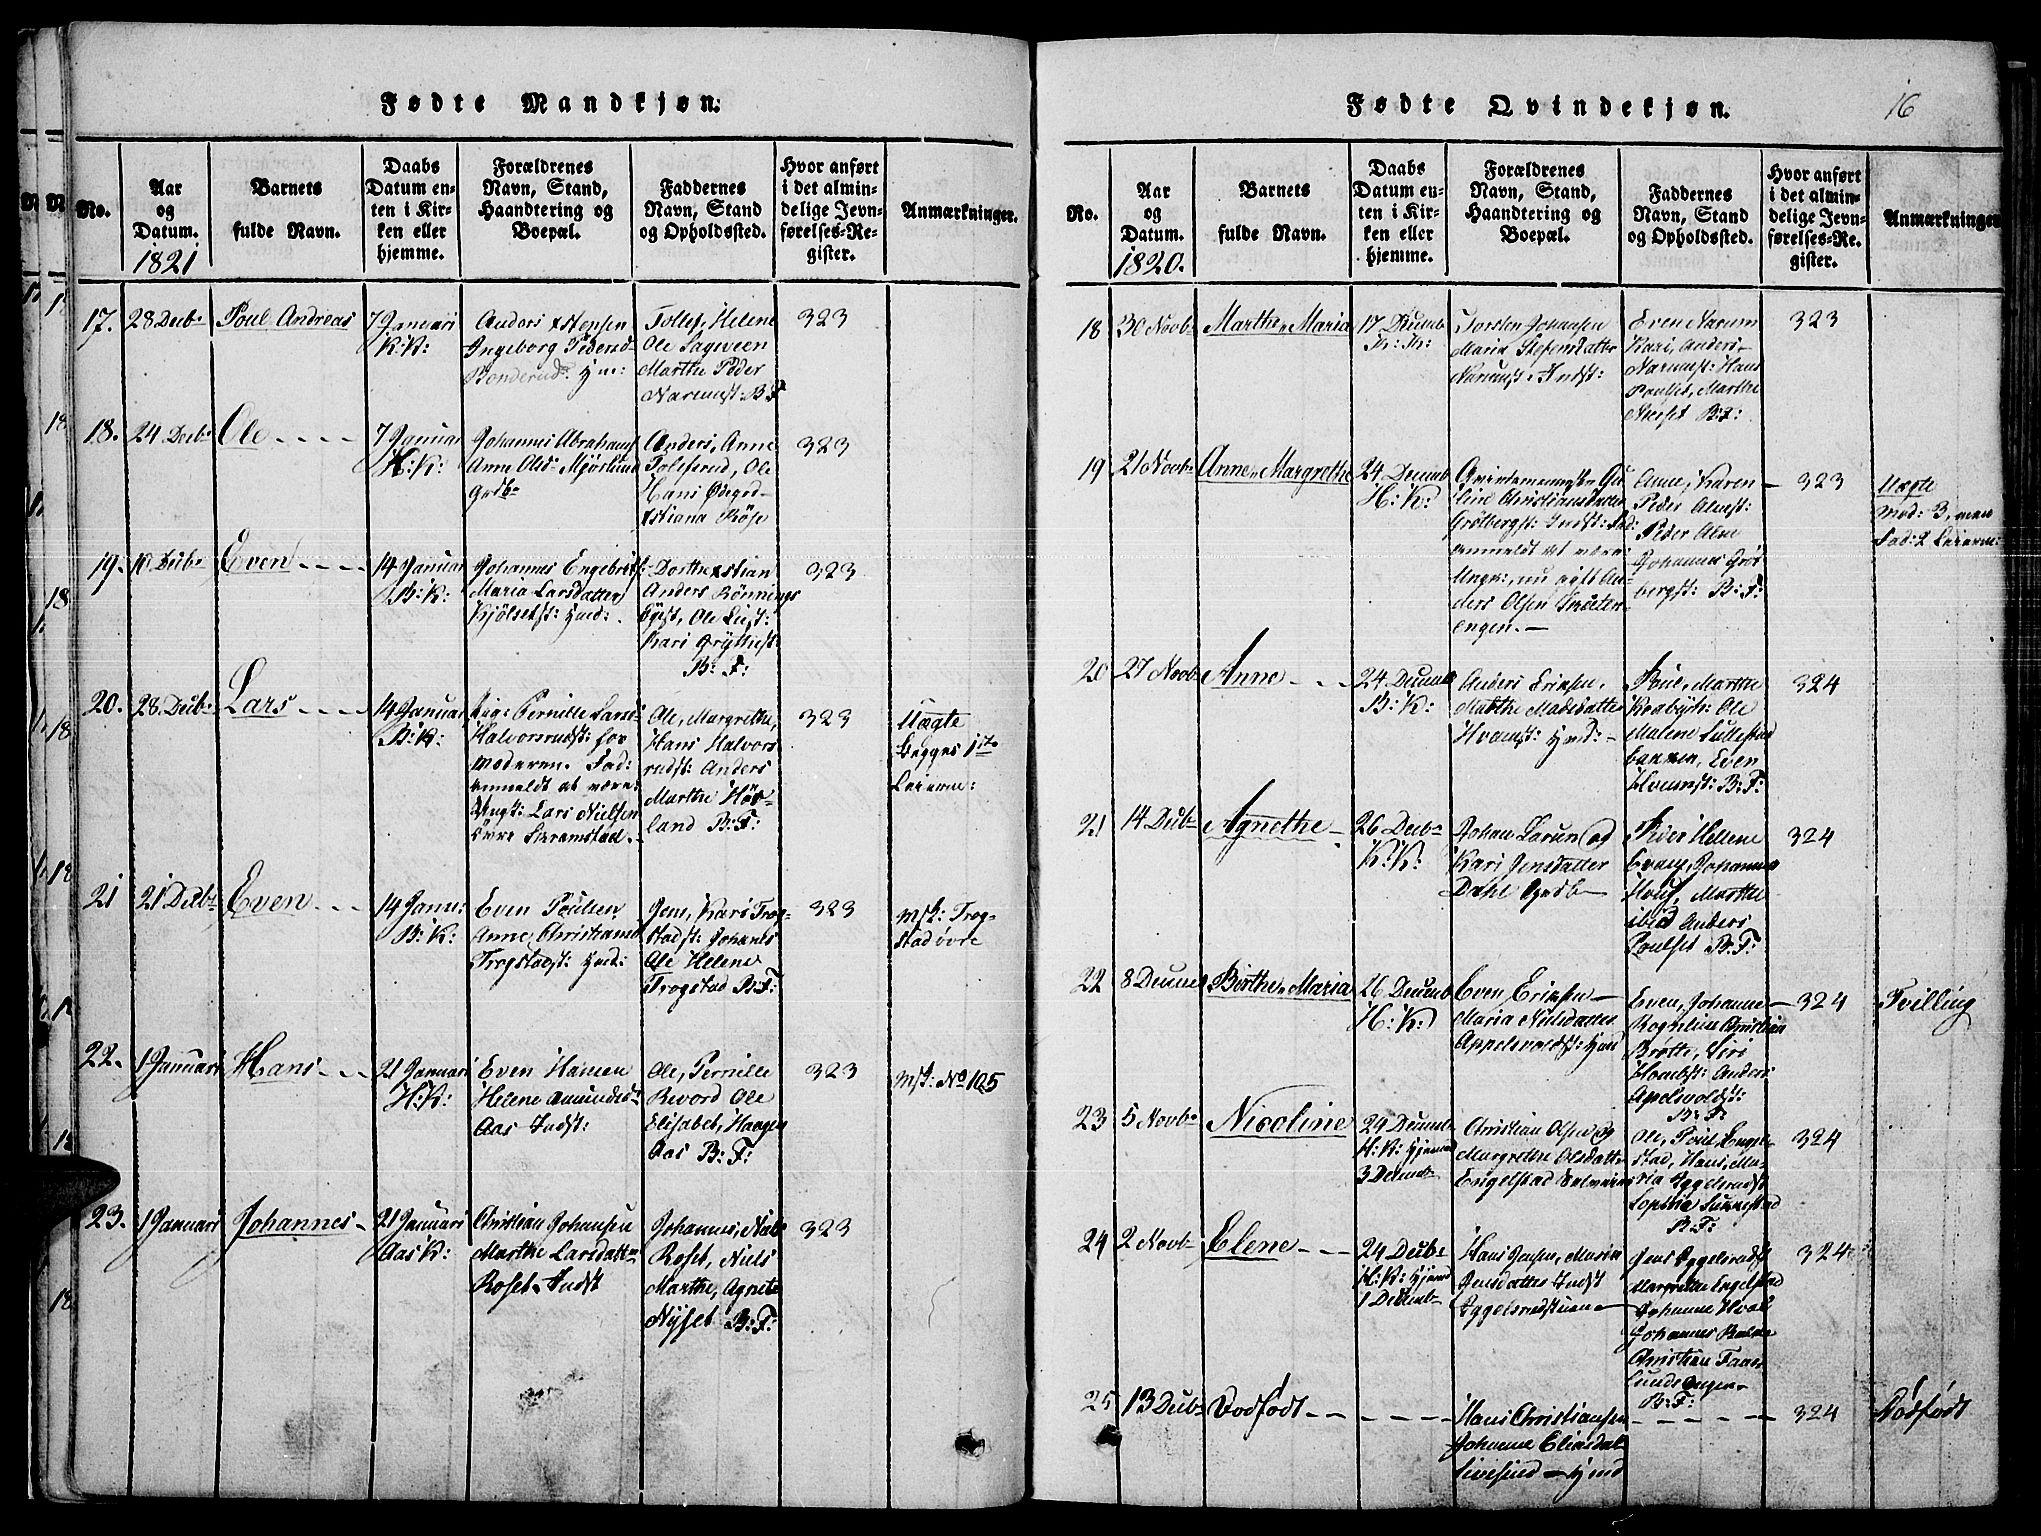 SAH, Toten prestekontor, Ministerialbok nr. 10, 1820-1828, s. 16